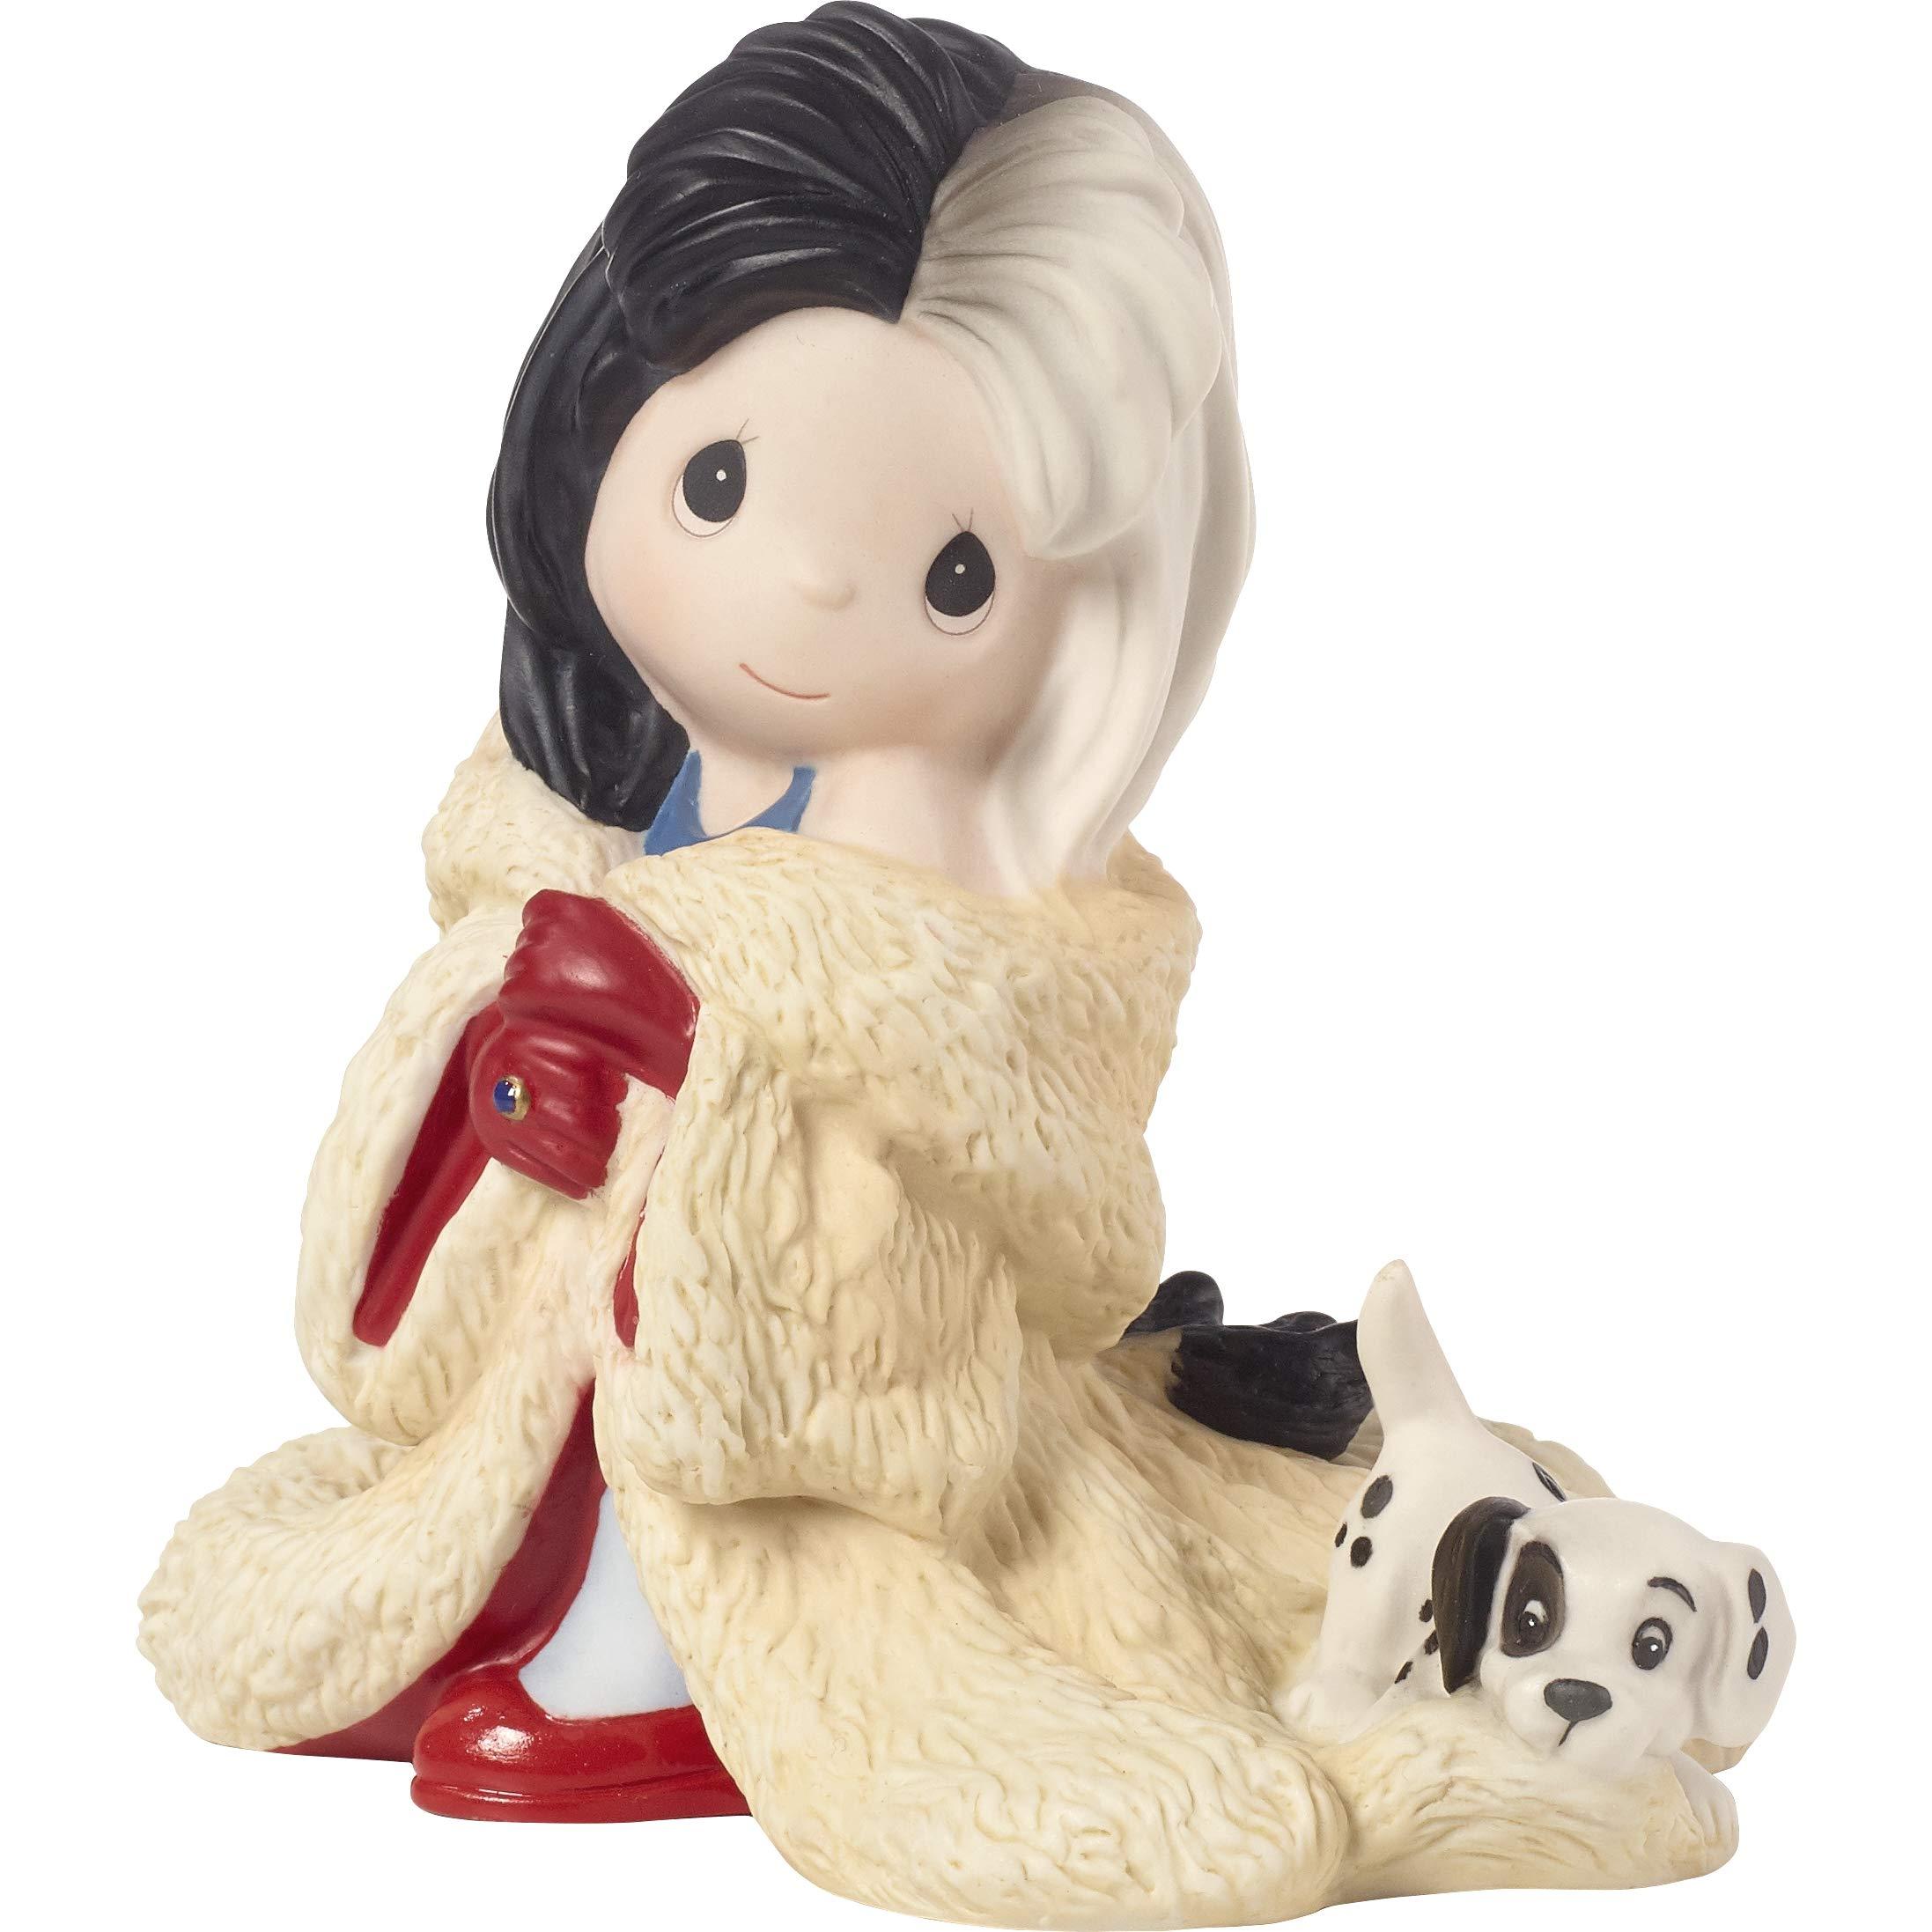 Precious Moments Disney Showcase Collection You're Such A Dahling Cruella De Vil Bisque Porcelain 183071 Figurine One Size Multi